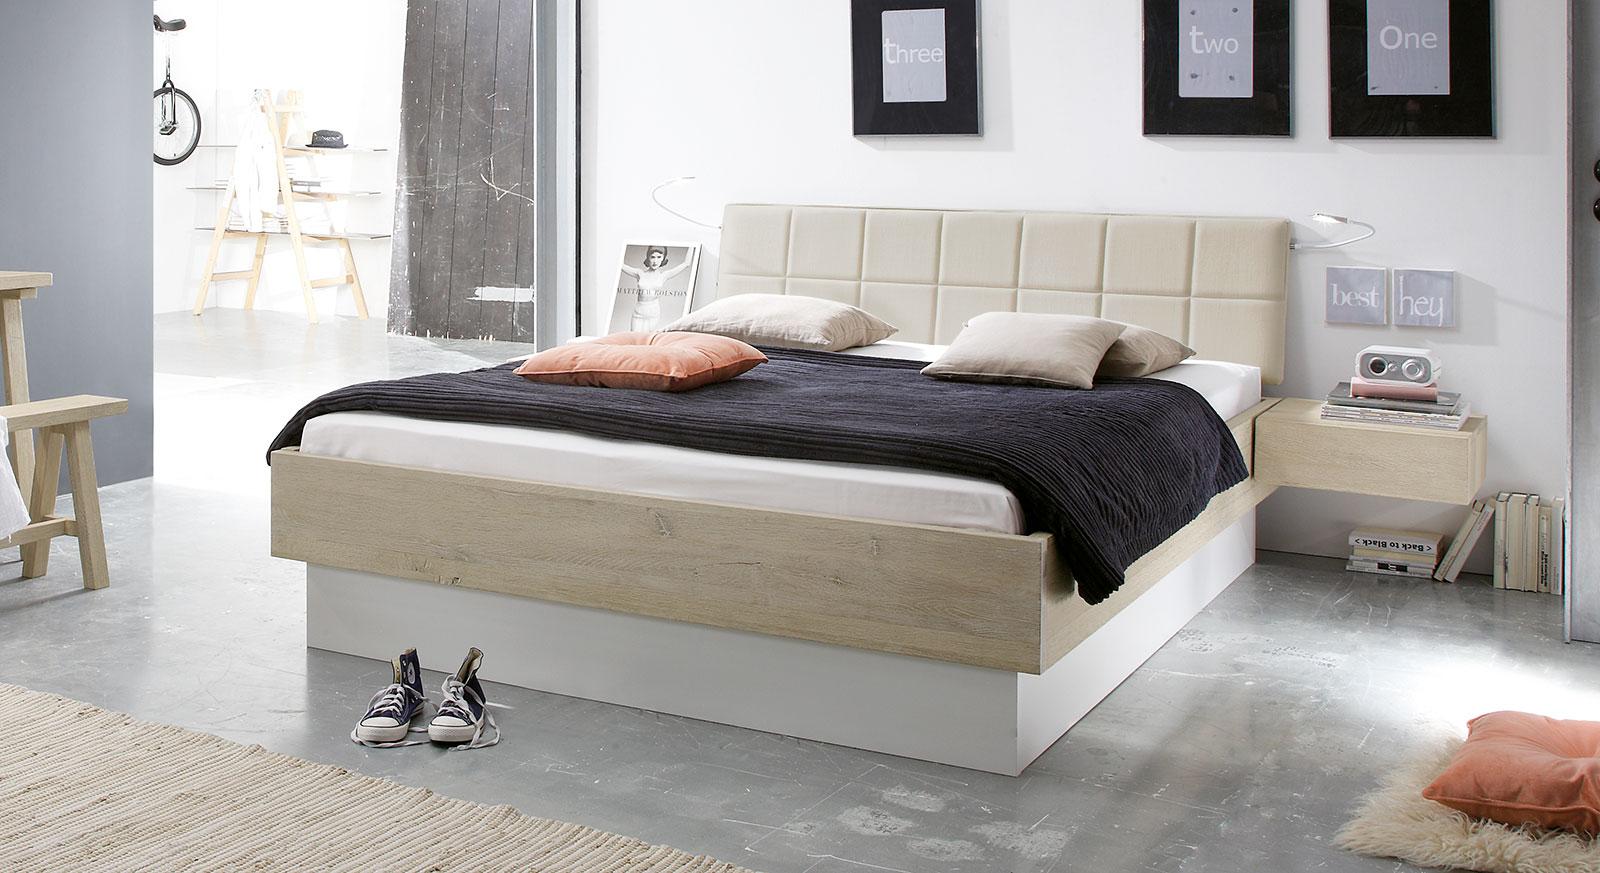 Stauraum-Bett Boneda aus Wildeiche inklusive Sockel